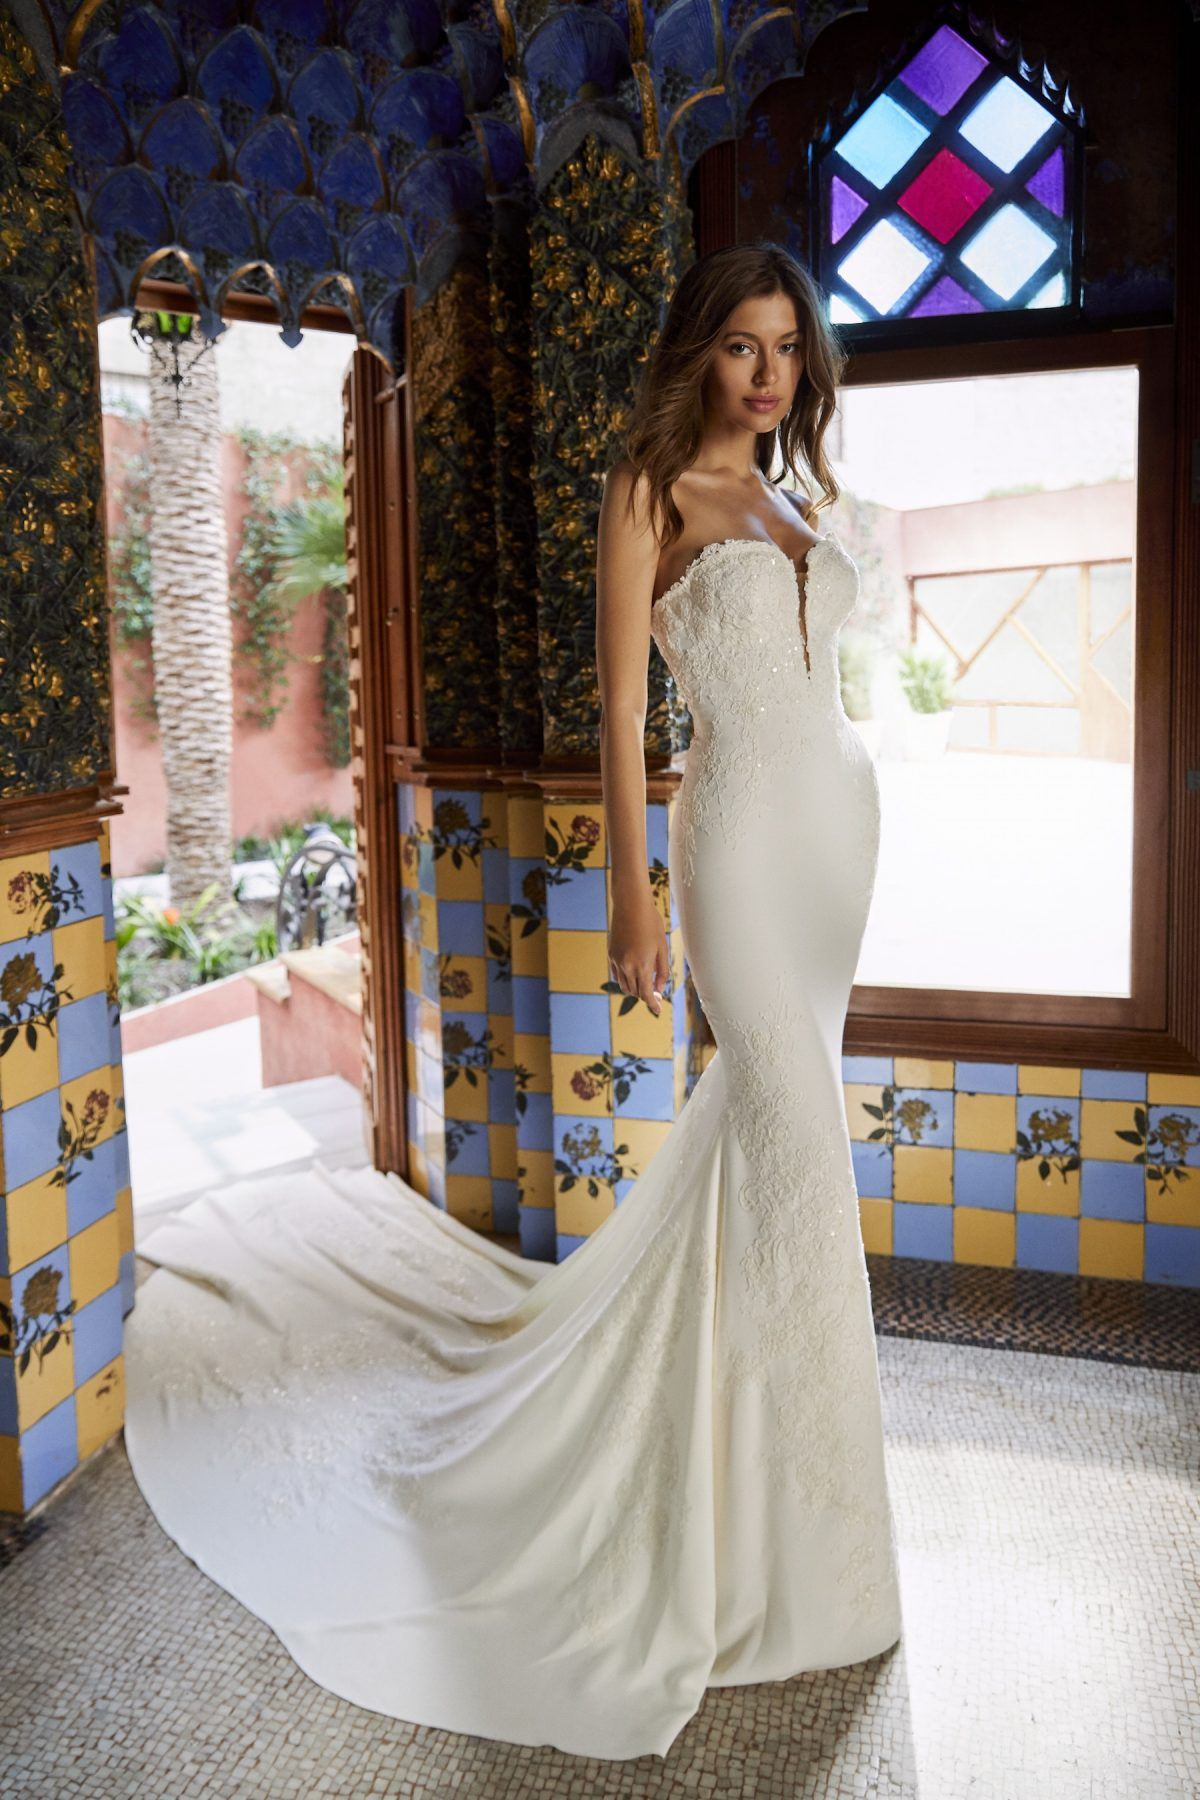 Beaded sheath wedding dress  Simple sweetheart crepe sheath wedding dress with beading and